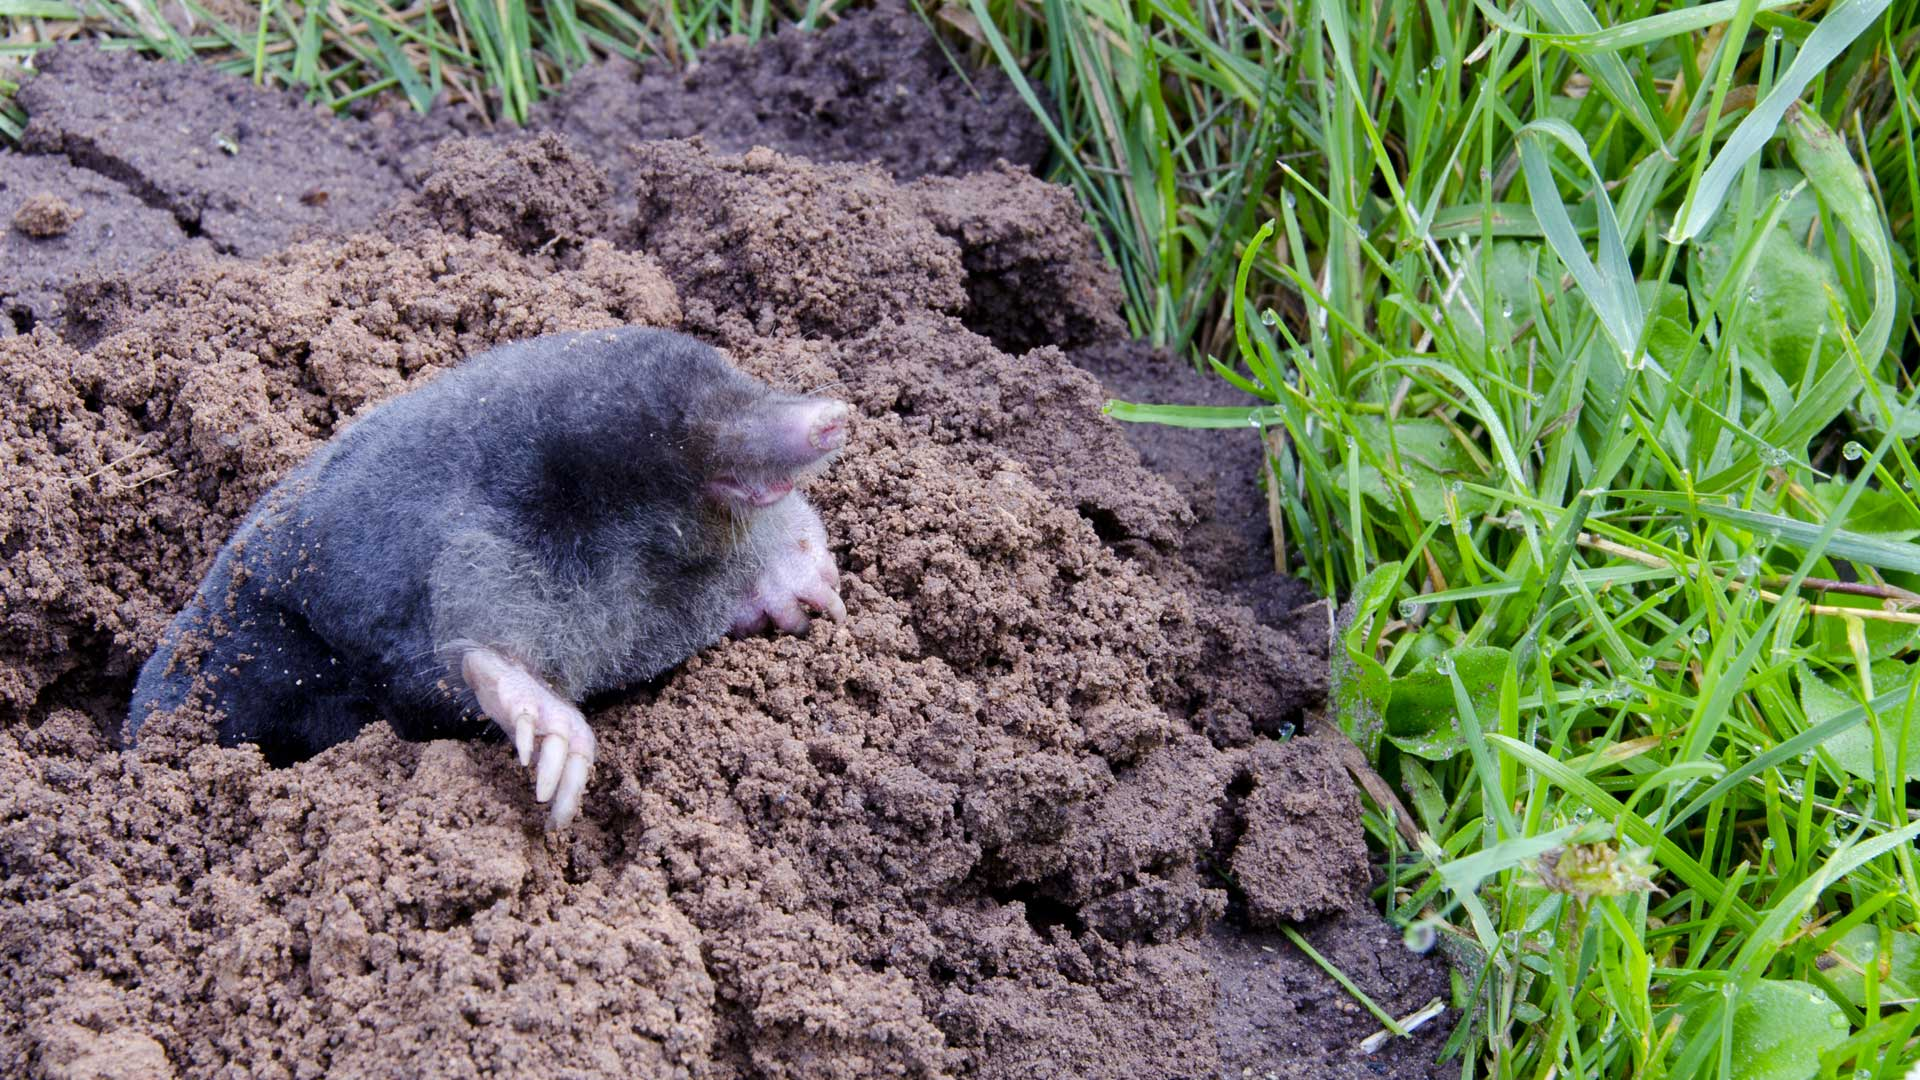 Columbus Mole Removal Of Ohio Directory Of Ohio Wildlife